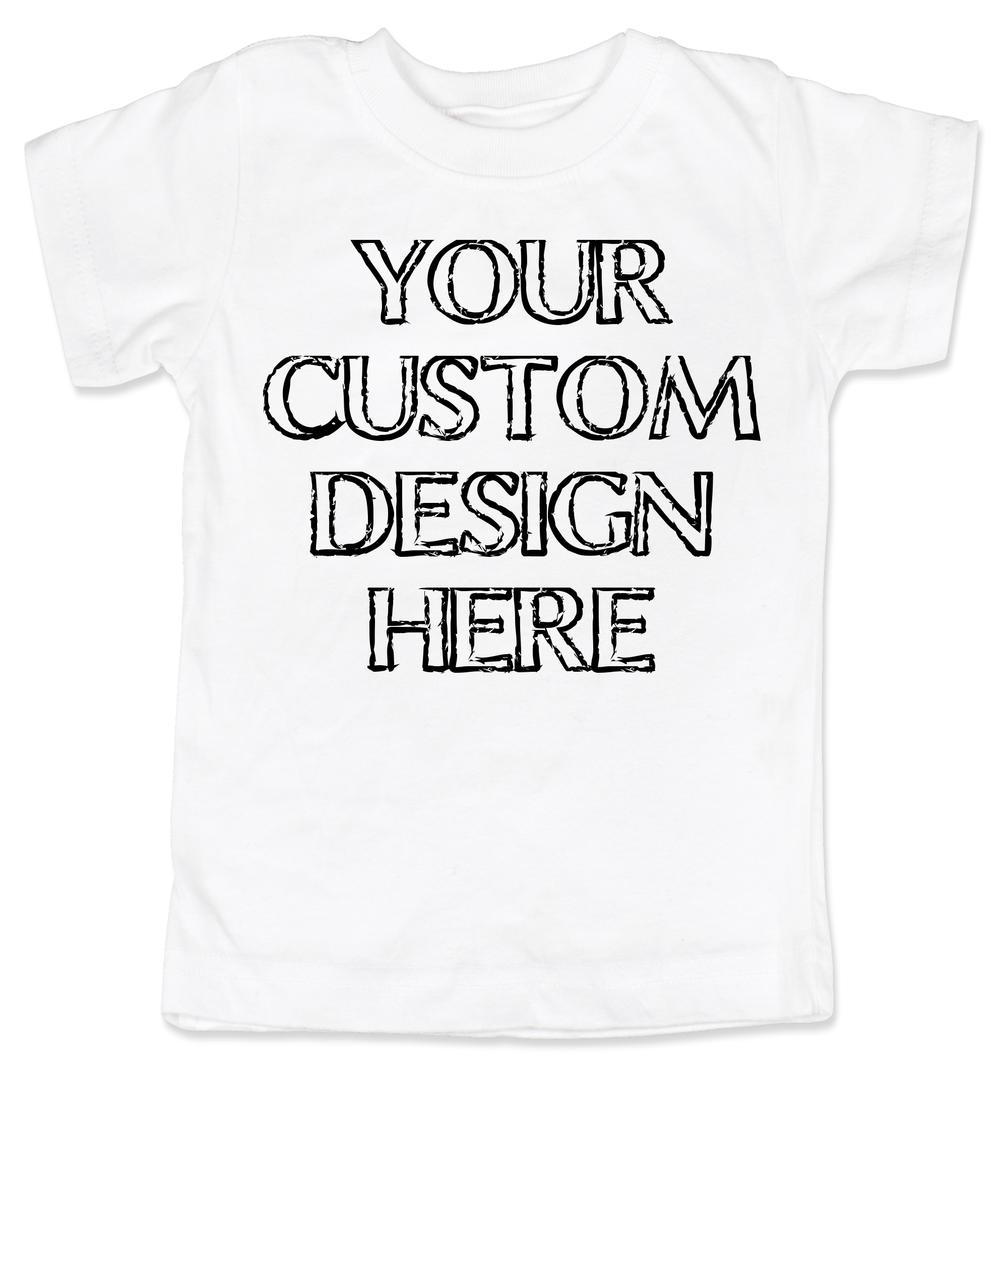 custom tank top Womens graphic tank custom graphic shirt Custom tank create your own design personalized shirt design your own tank